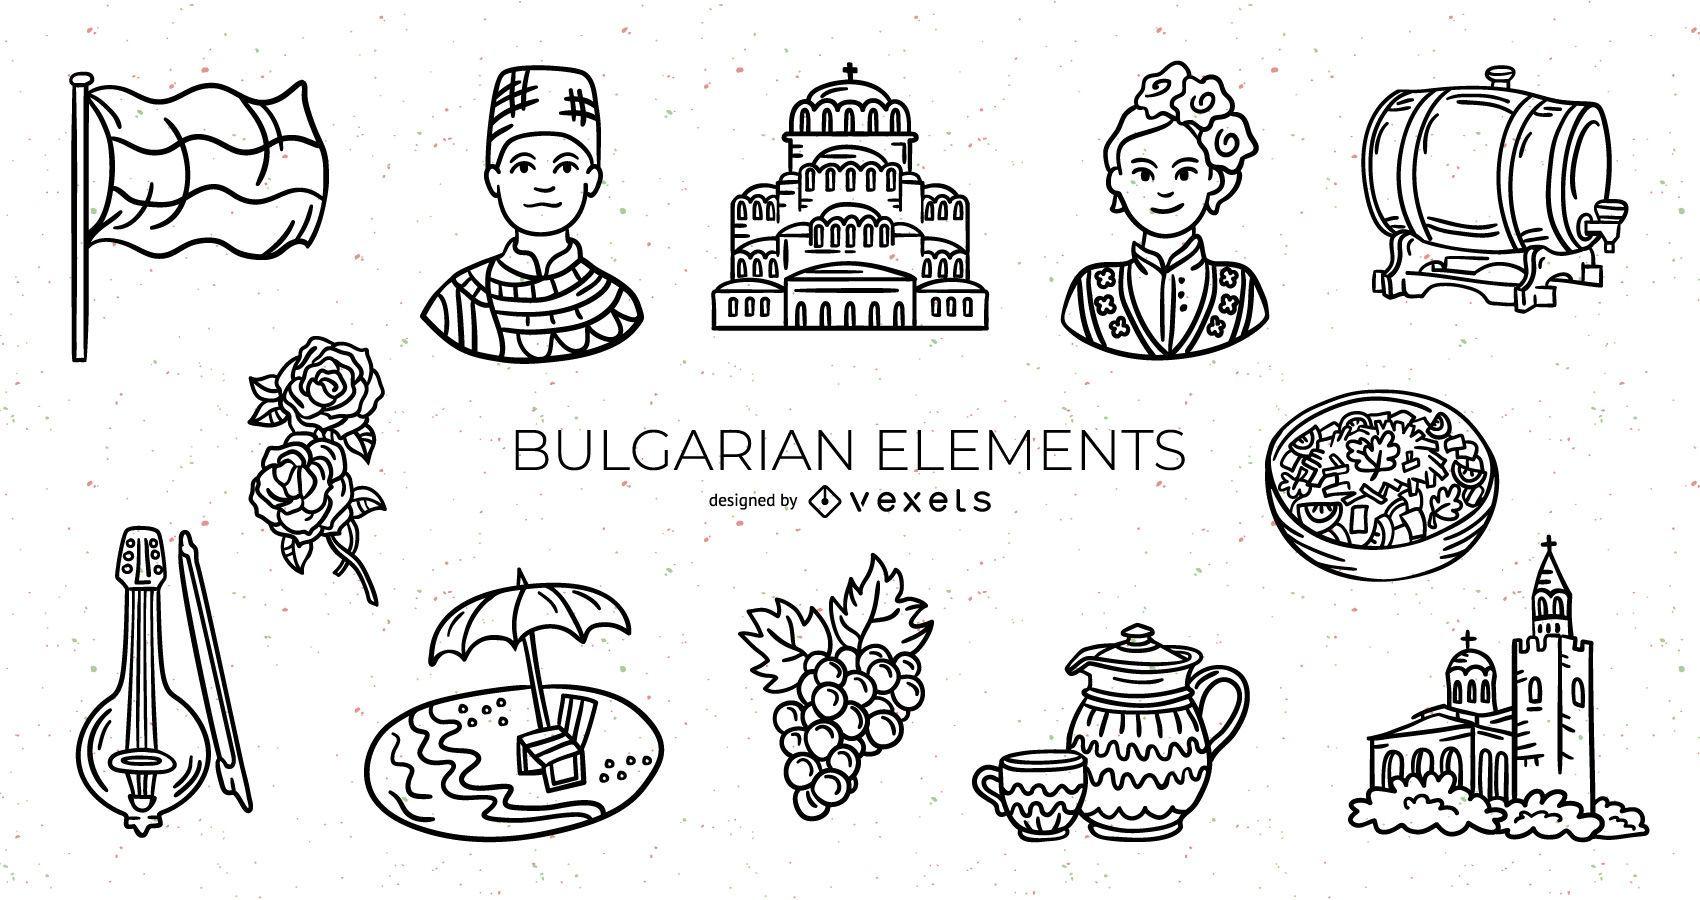 Bulgarian Stroke Elements Design Pack